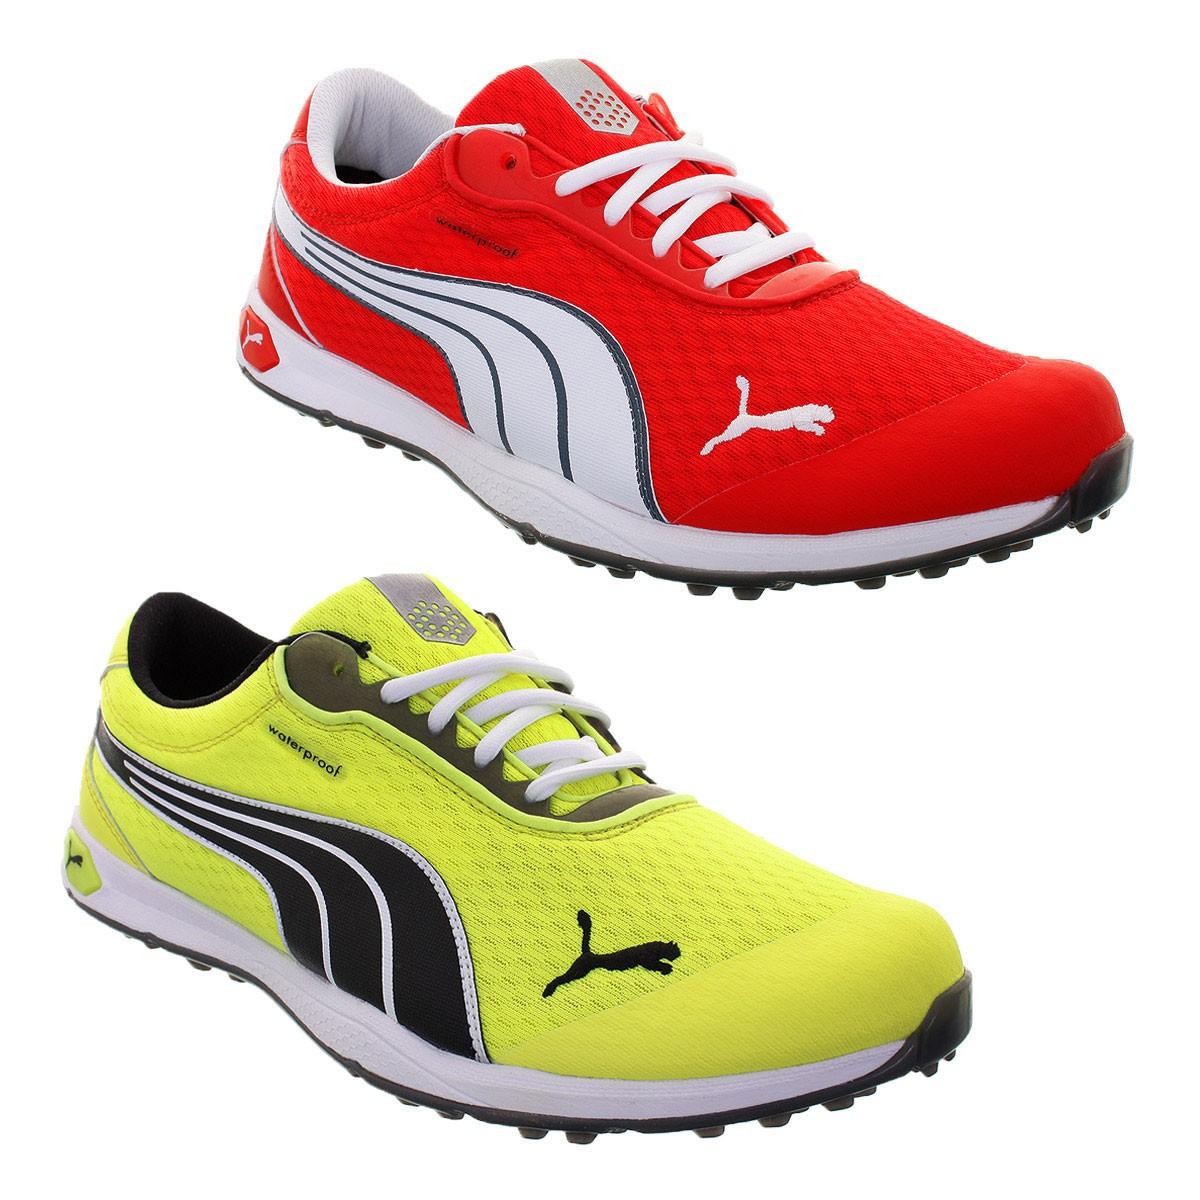 54f03f9298e Puma Golf Mens Waterproof Biofusion SL Mesh Spikeless Golf Shoes ...